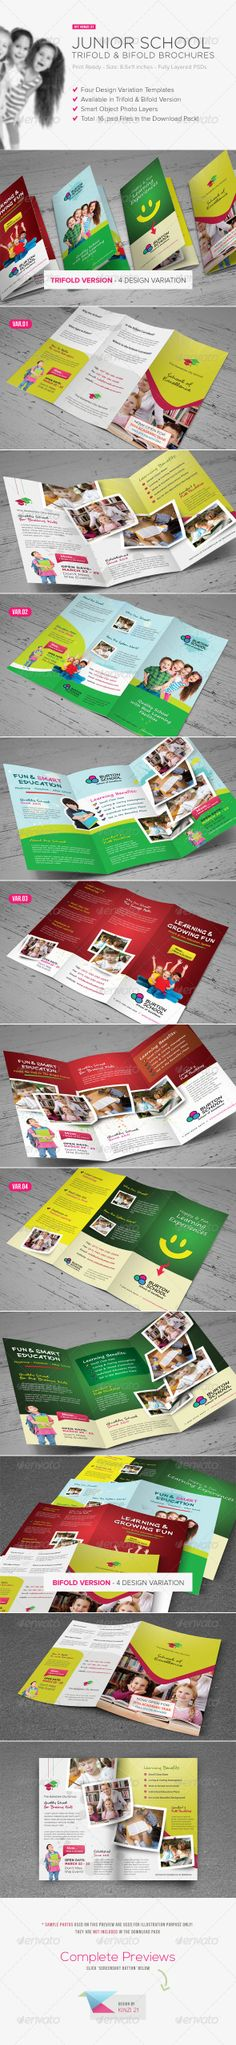 Pediatrician \ Child Care - Brochure Template Graphic design - sample business brochure